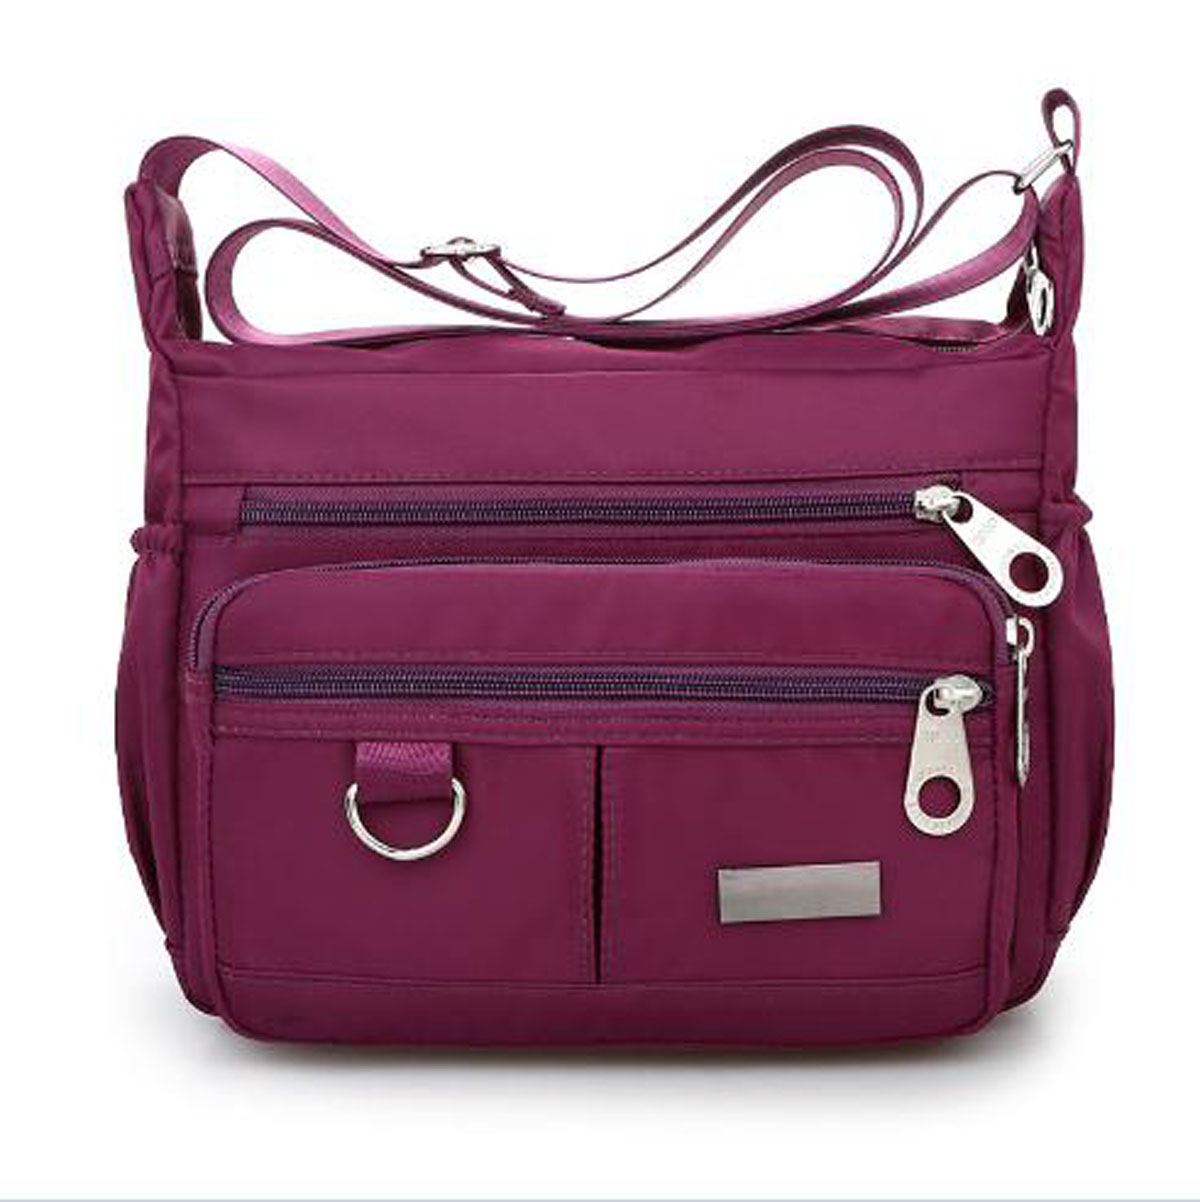 Women Lady Multi Pocket Messenger Bags Crossbody Shoulder Bag Casual Handbag Messenger Crossbody Bag Nylon Purse Waterproof Side Bags Handbag Brands From Asomemistake 24 3 Dhgate Com